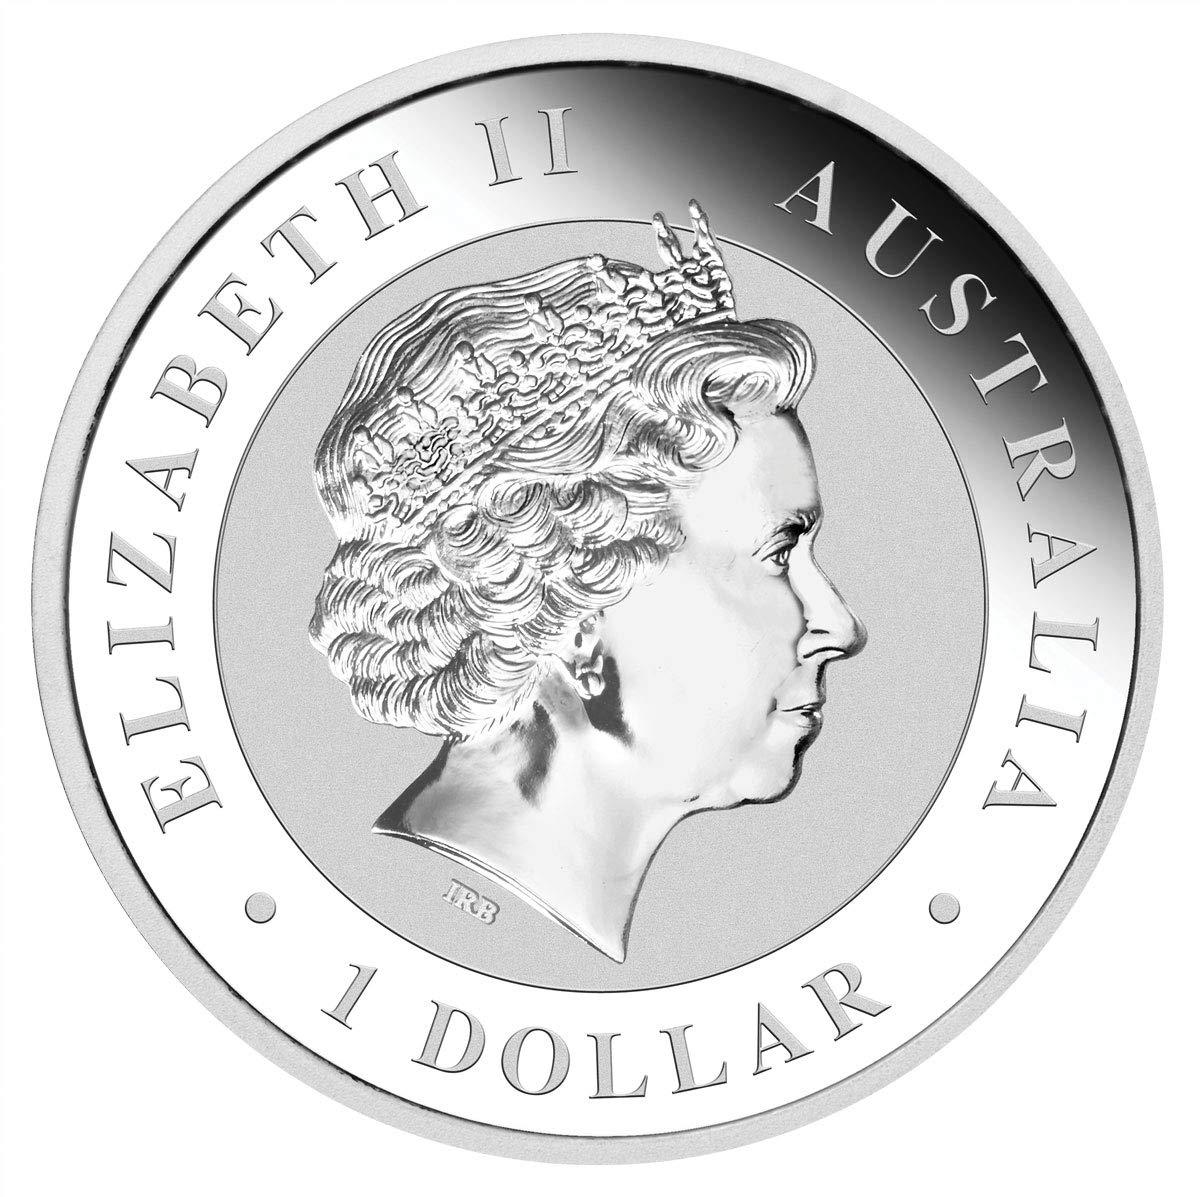 2019 AU Kookaburra 1oz .9999 Fine Silver Coin Dollar Uncircualted Mint